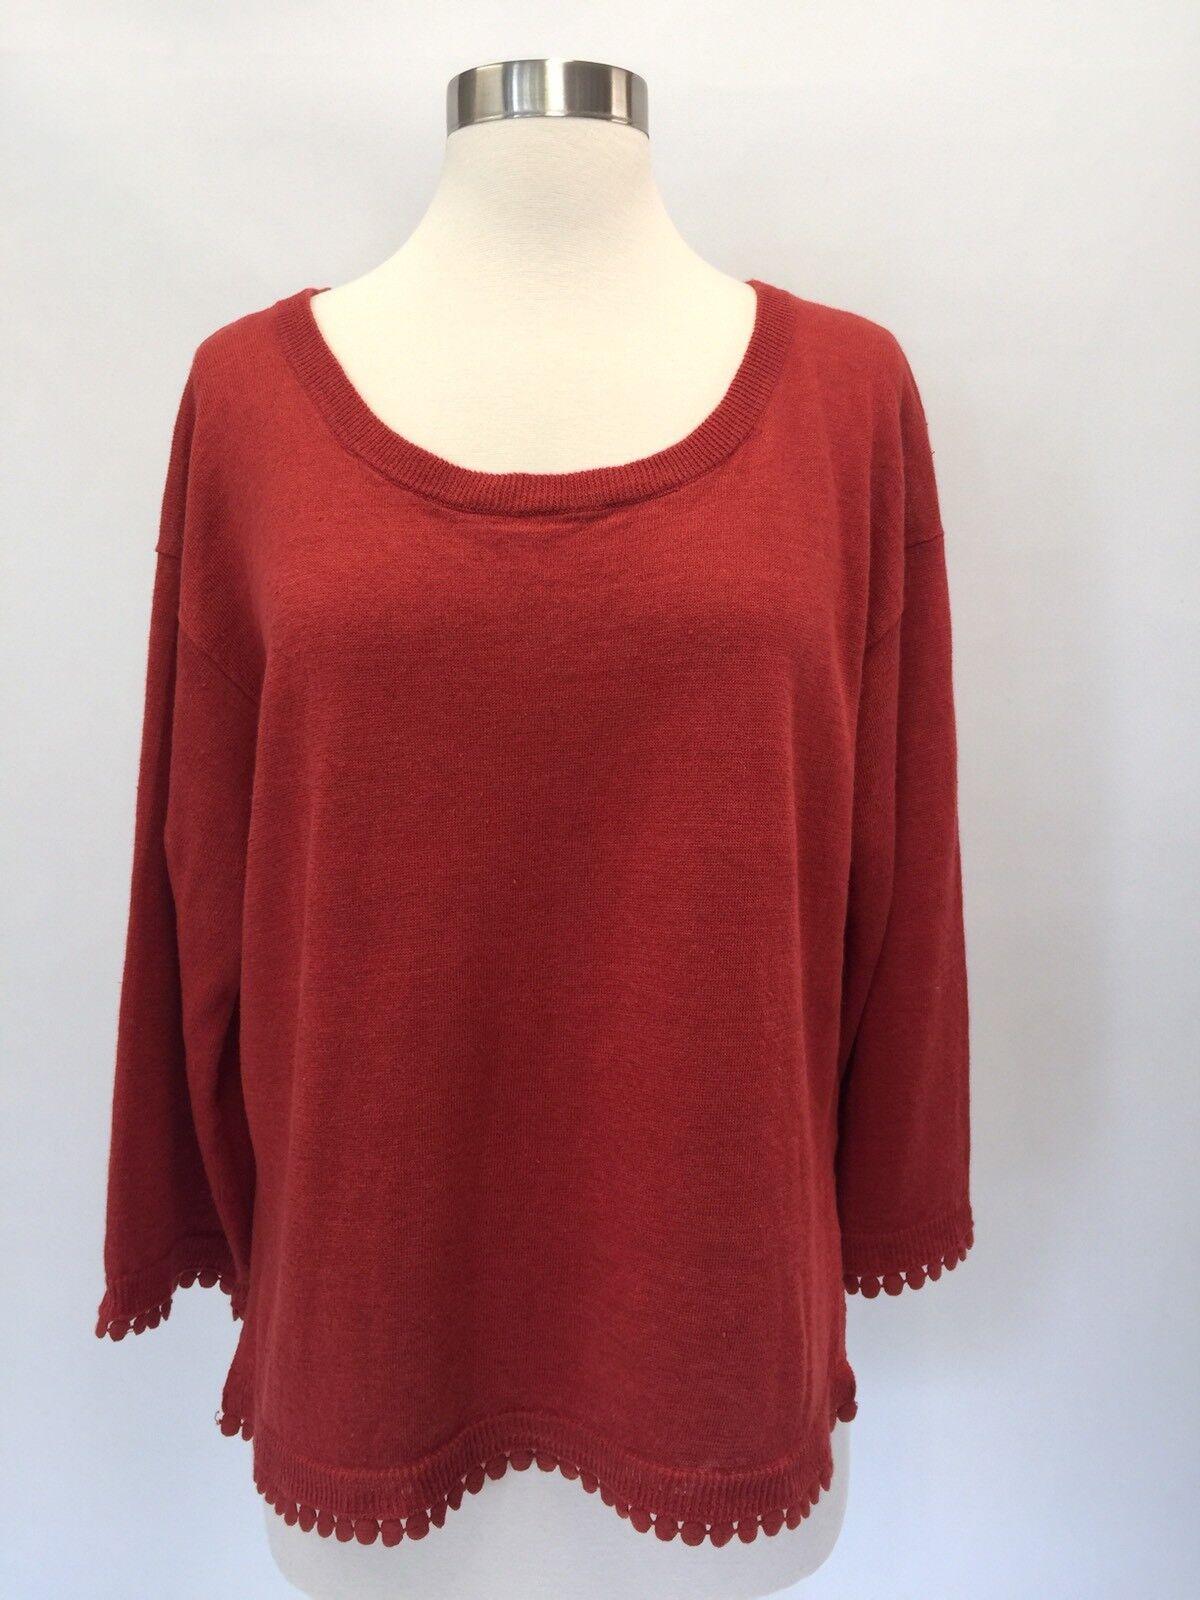 J Crew Women Linen sweater with pom-pom trim G5362 orange Mustard Brown Size M